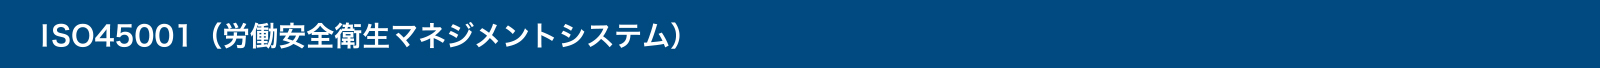 ISO45001(労働安全衛生マネジメントシステム)